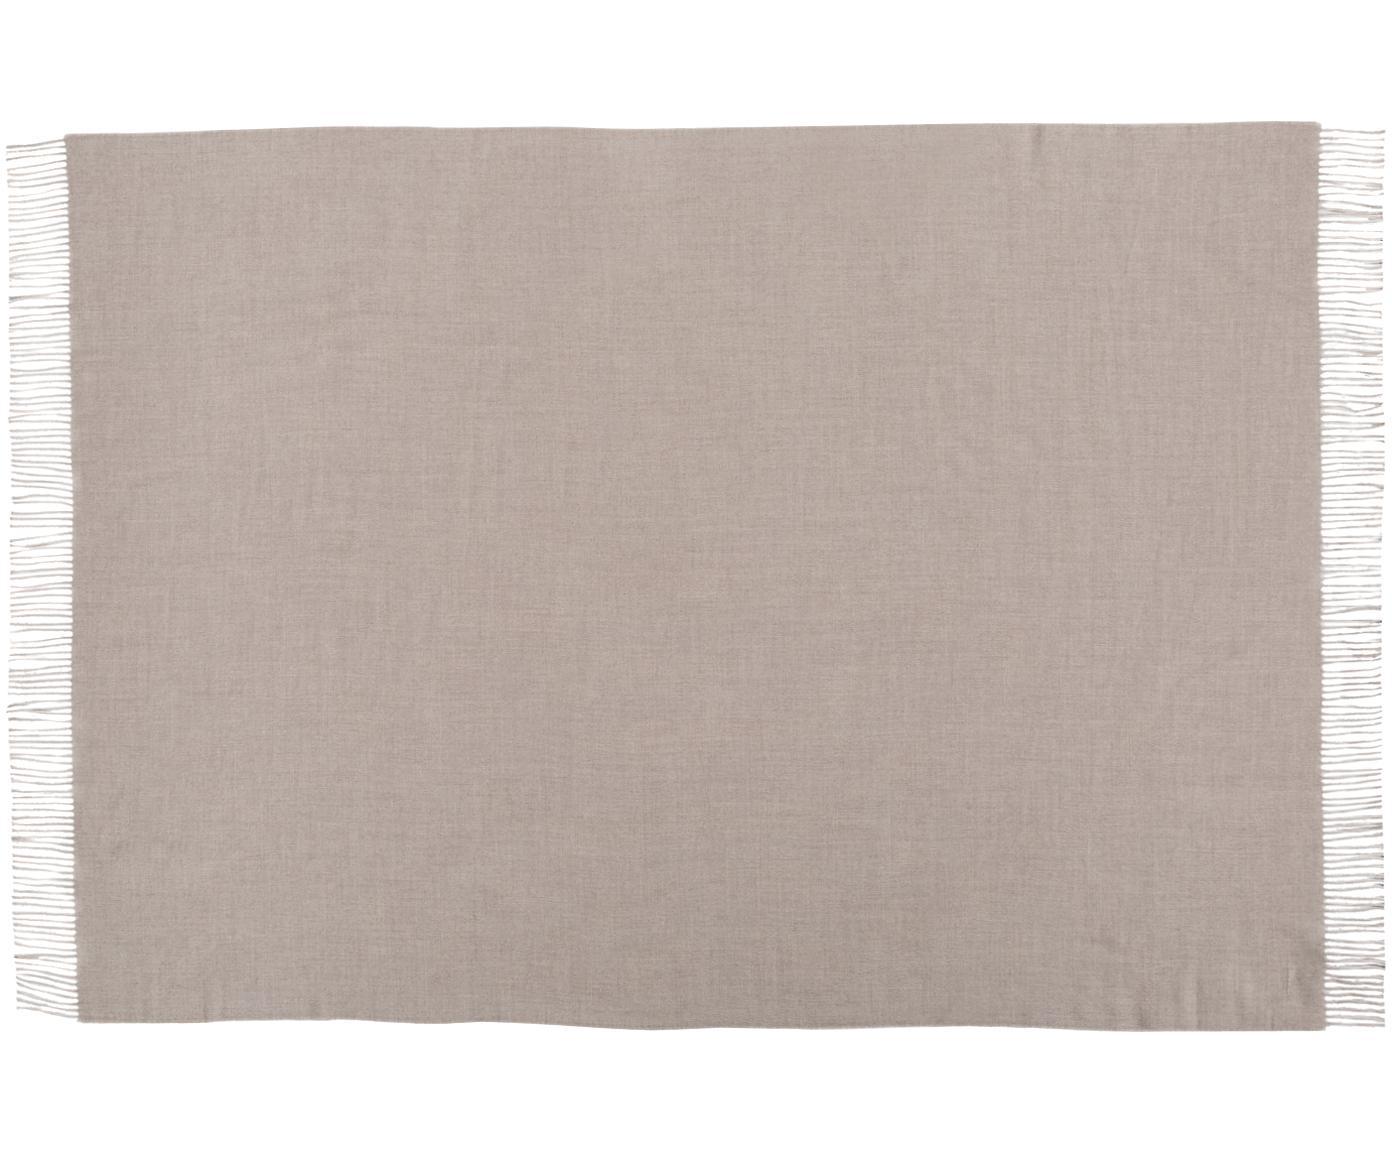 Alpacawollen plaid Luxury, Beige, 130 x 200 cm